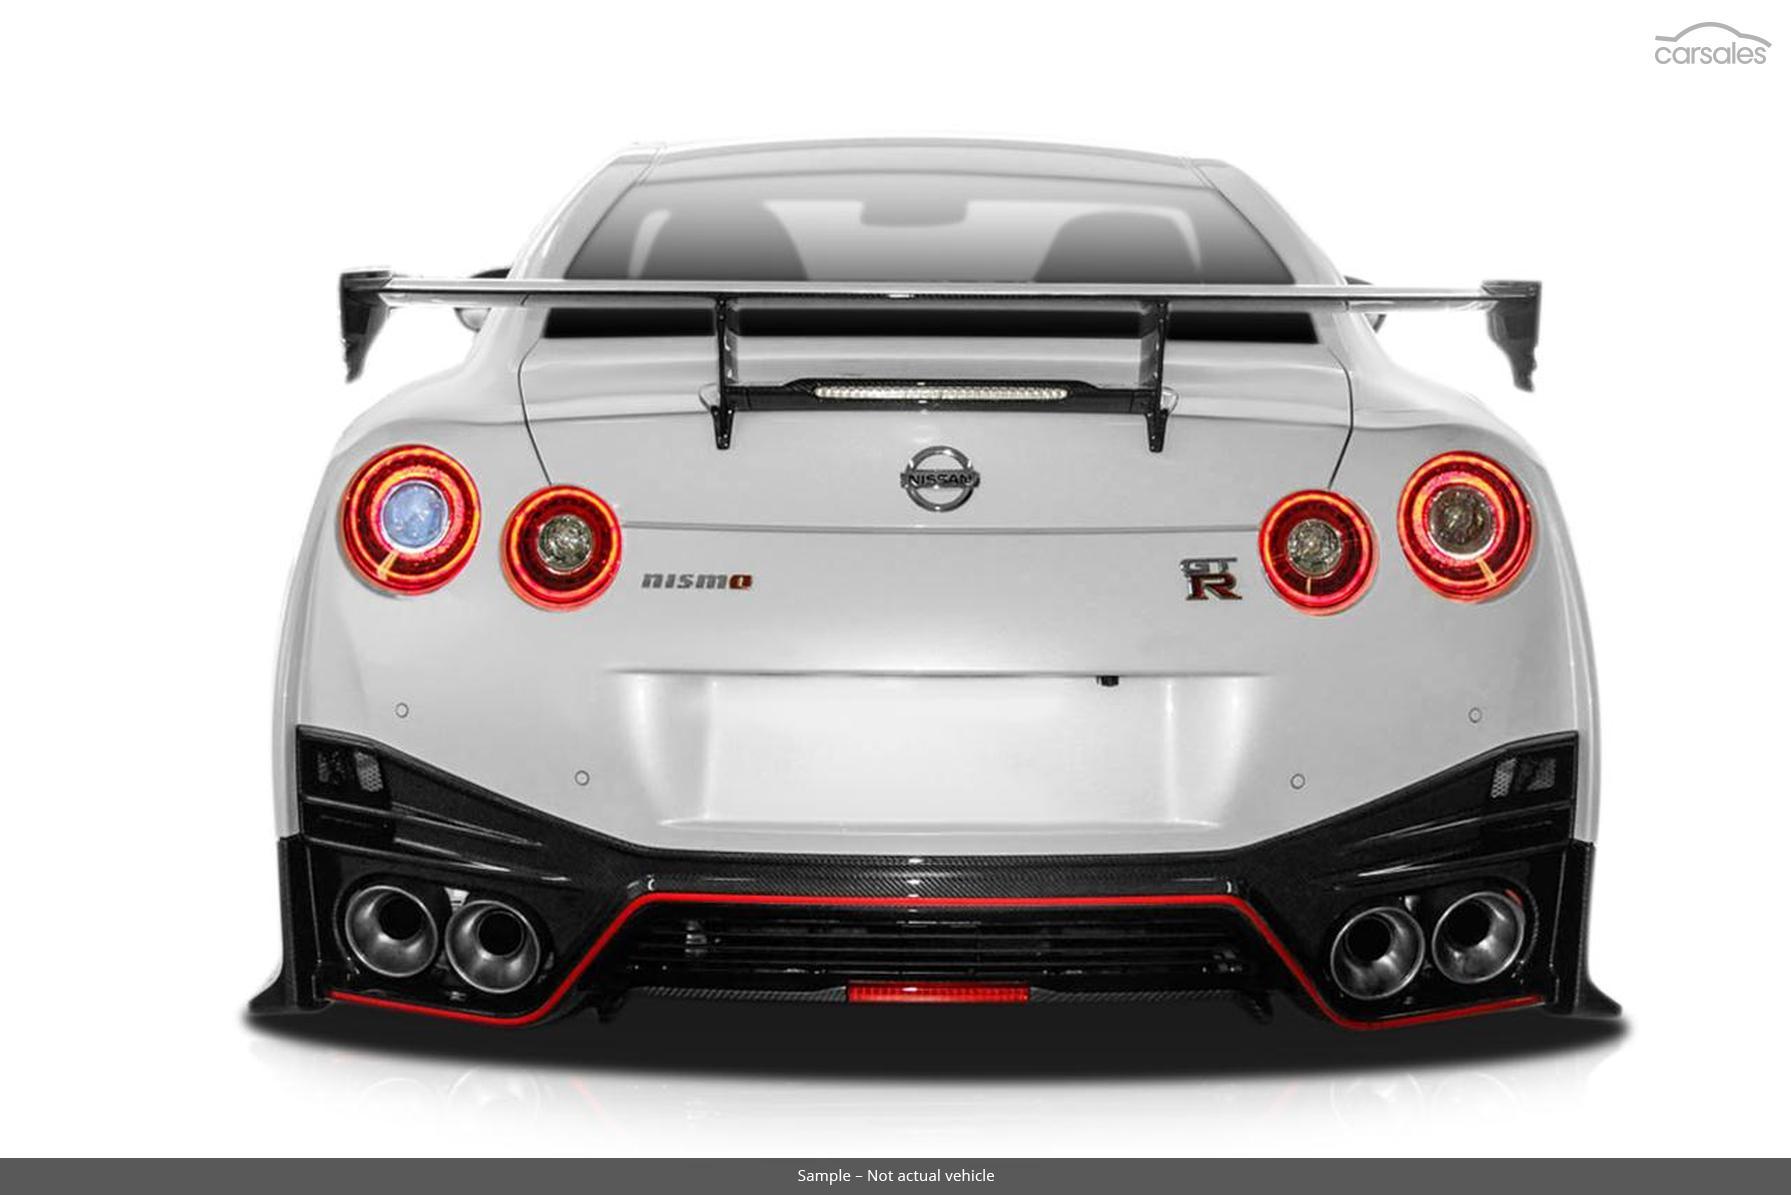 2018 Nissan Gt R Nismo R35 Auto Awd My17 Shrm Ad 5844508 Consumer Electronics Vehicle Gps Car Video